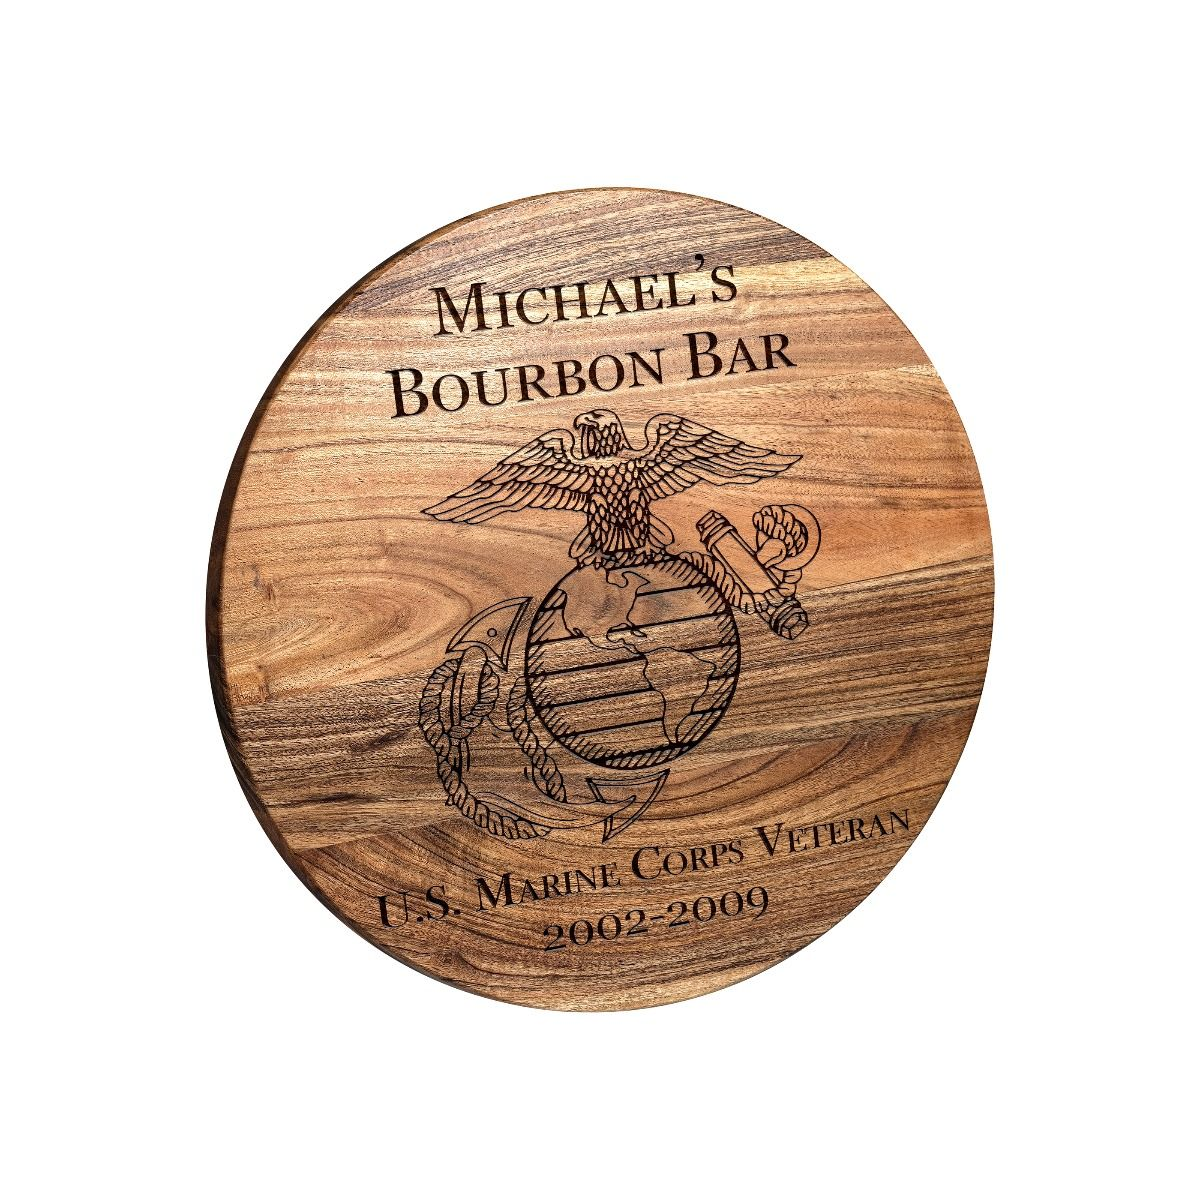 USMC Emblem Bar Sign